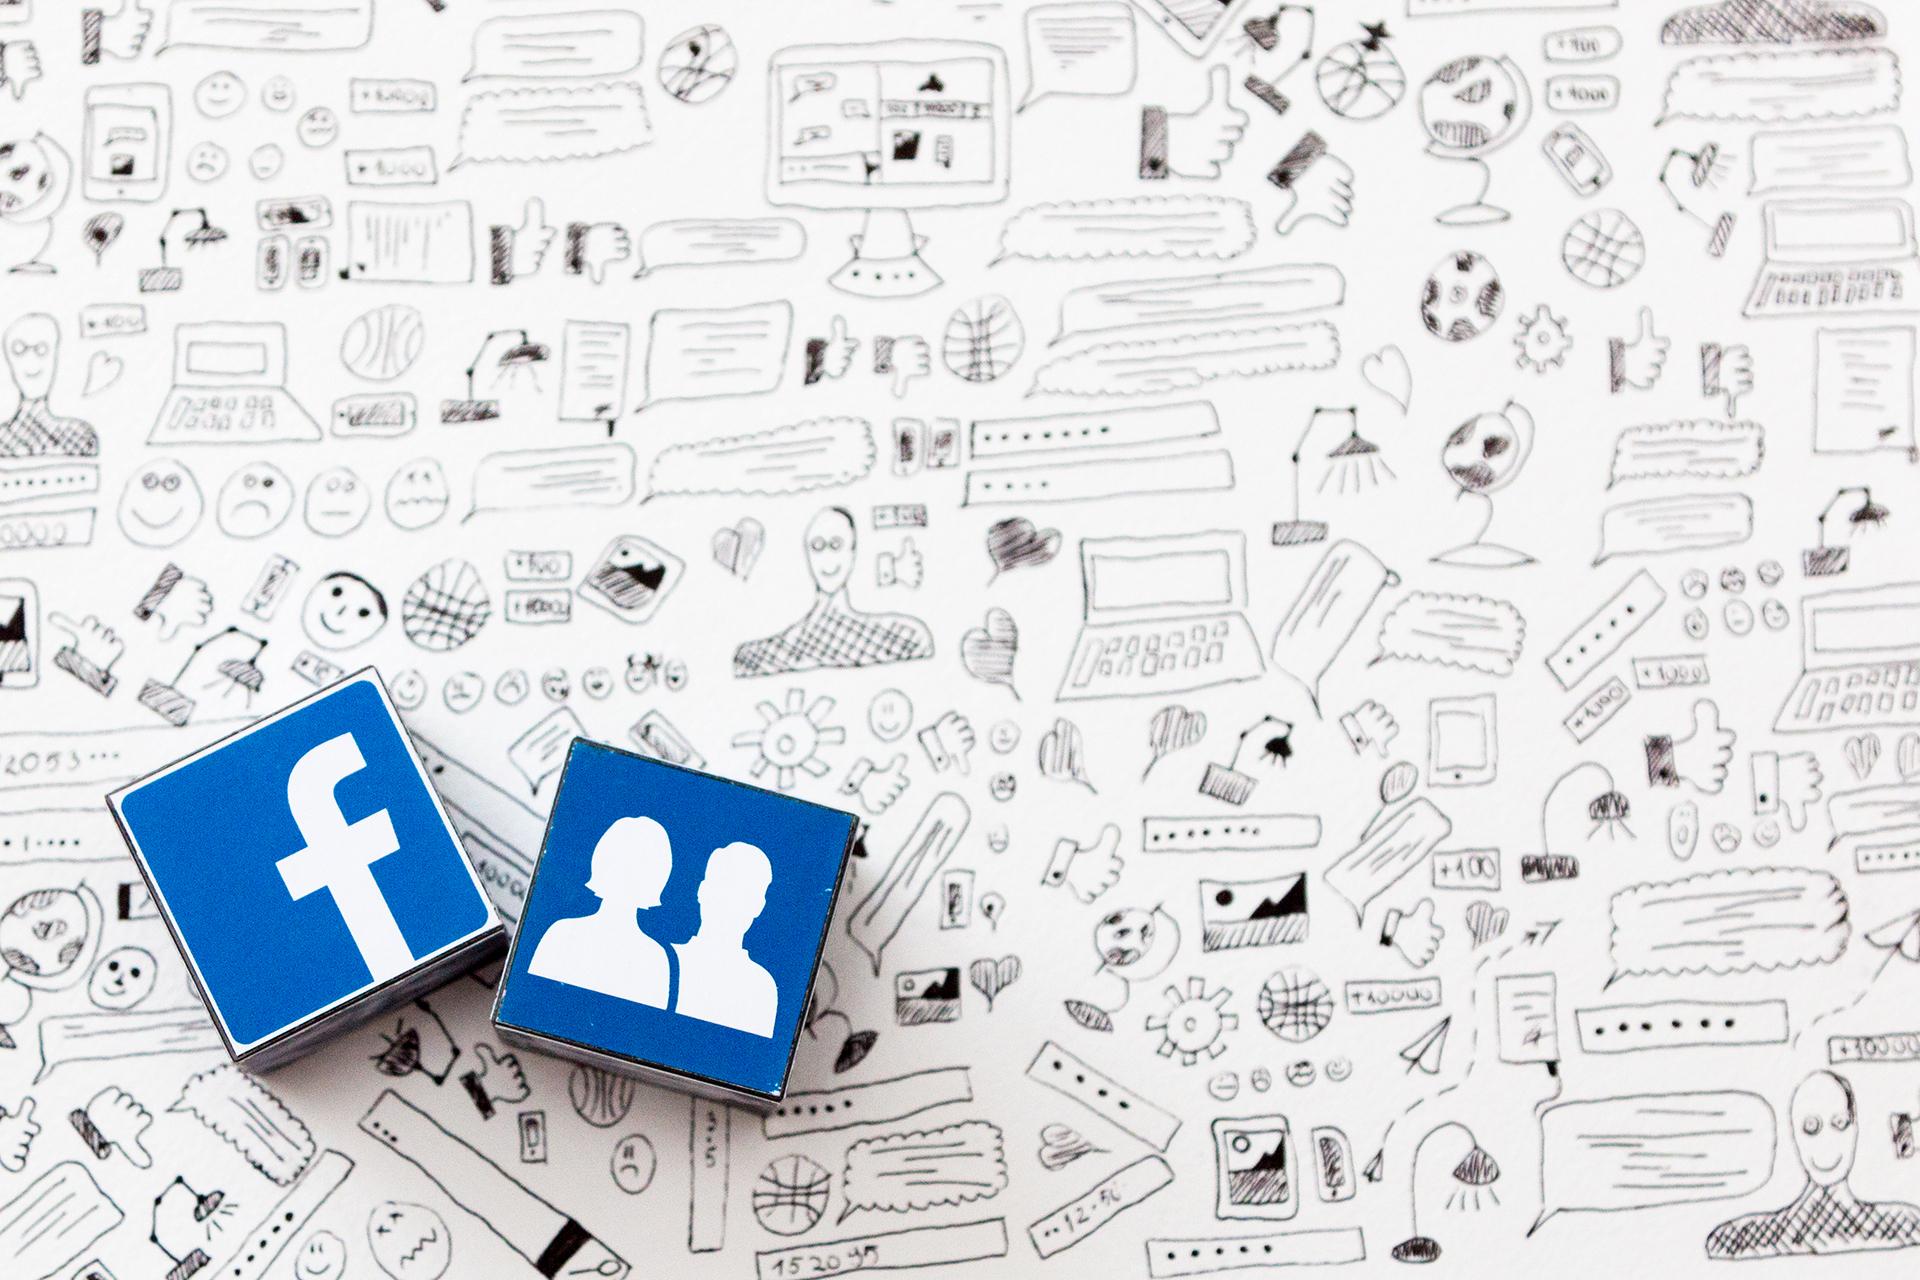 Nowe strony na Facebooku Online Group